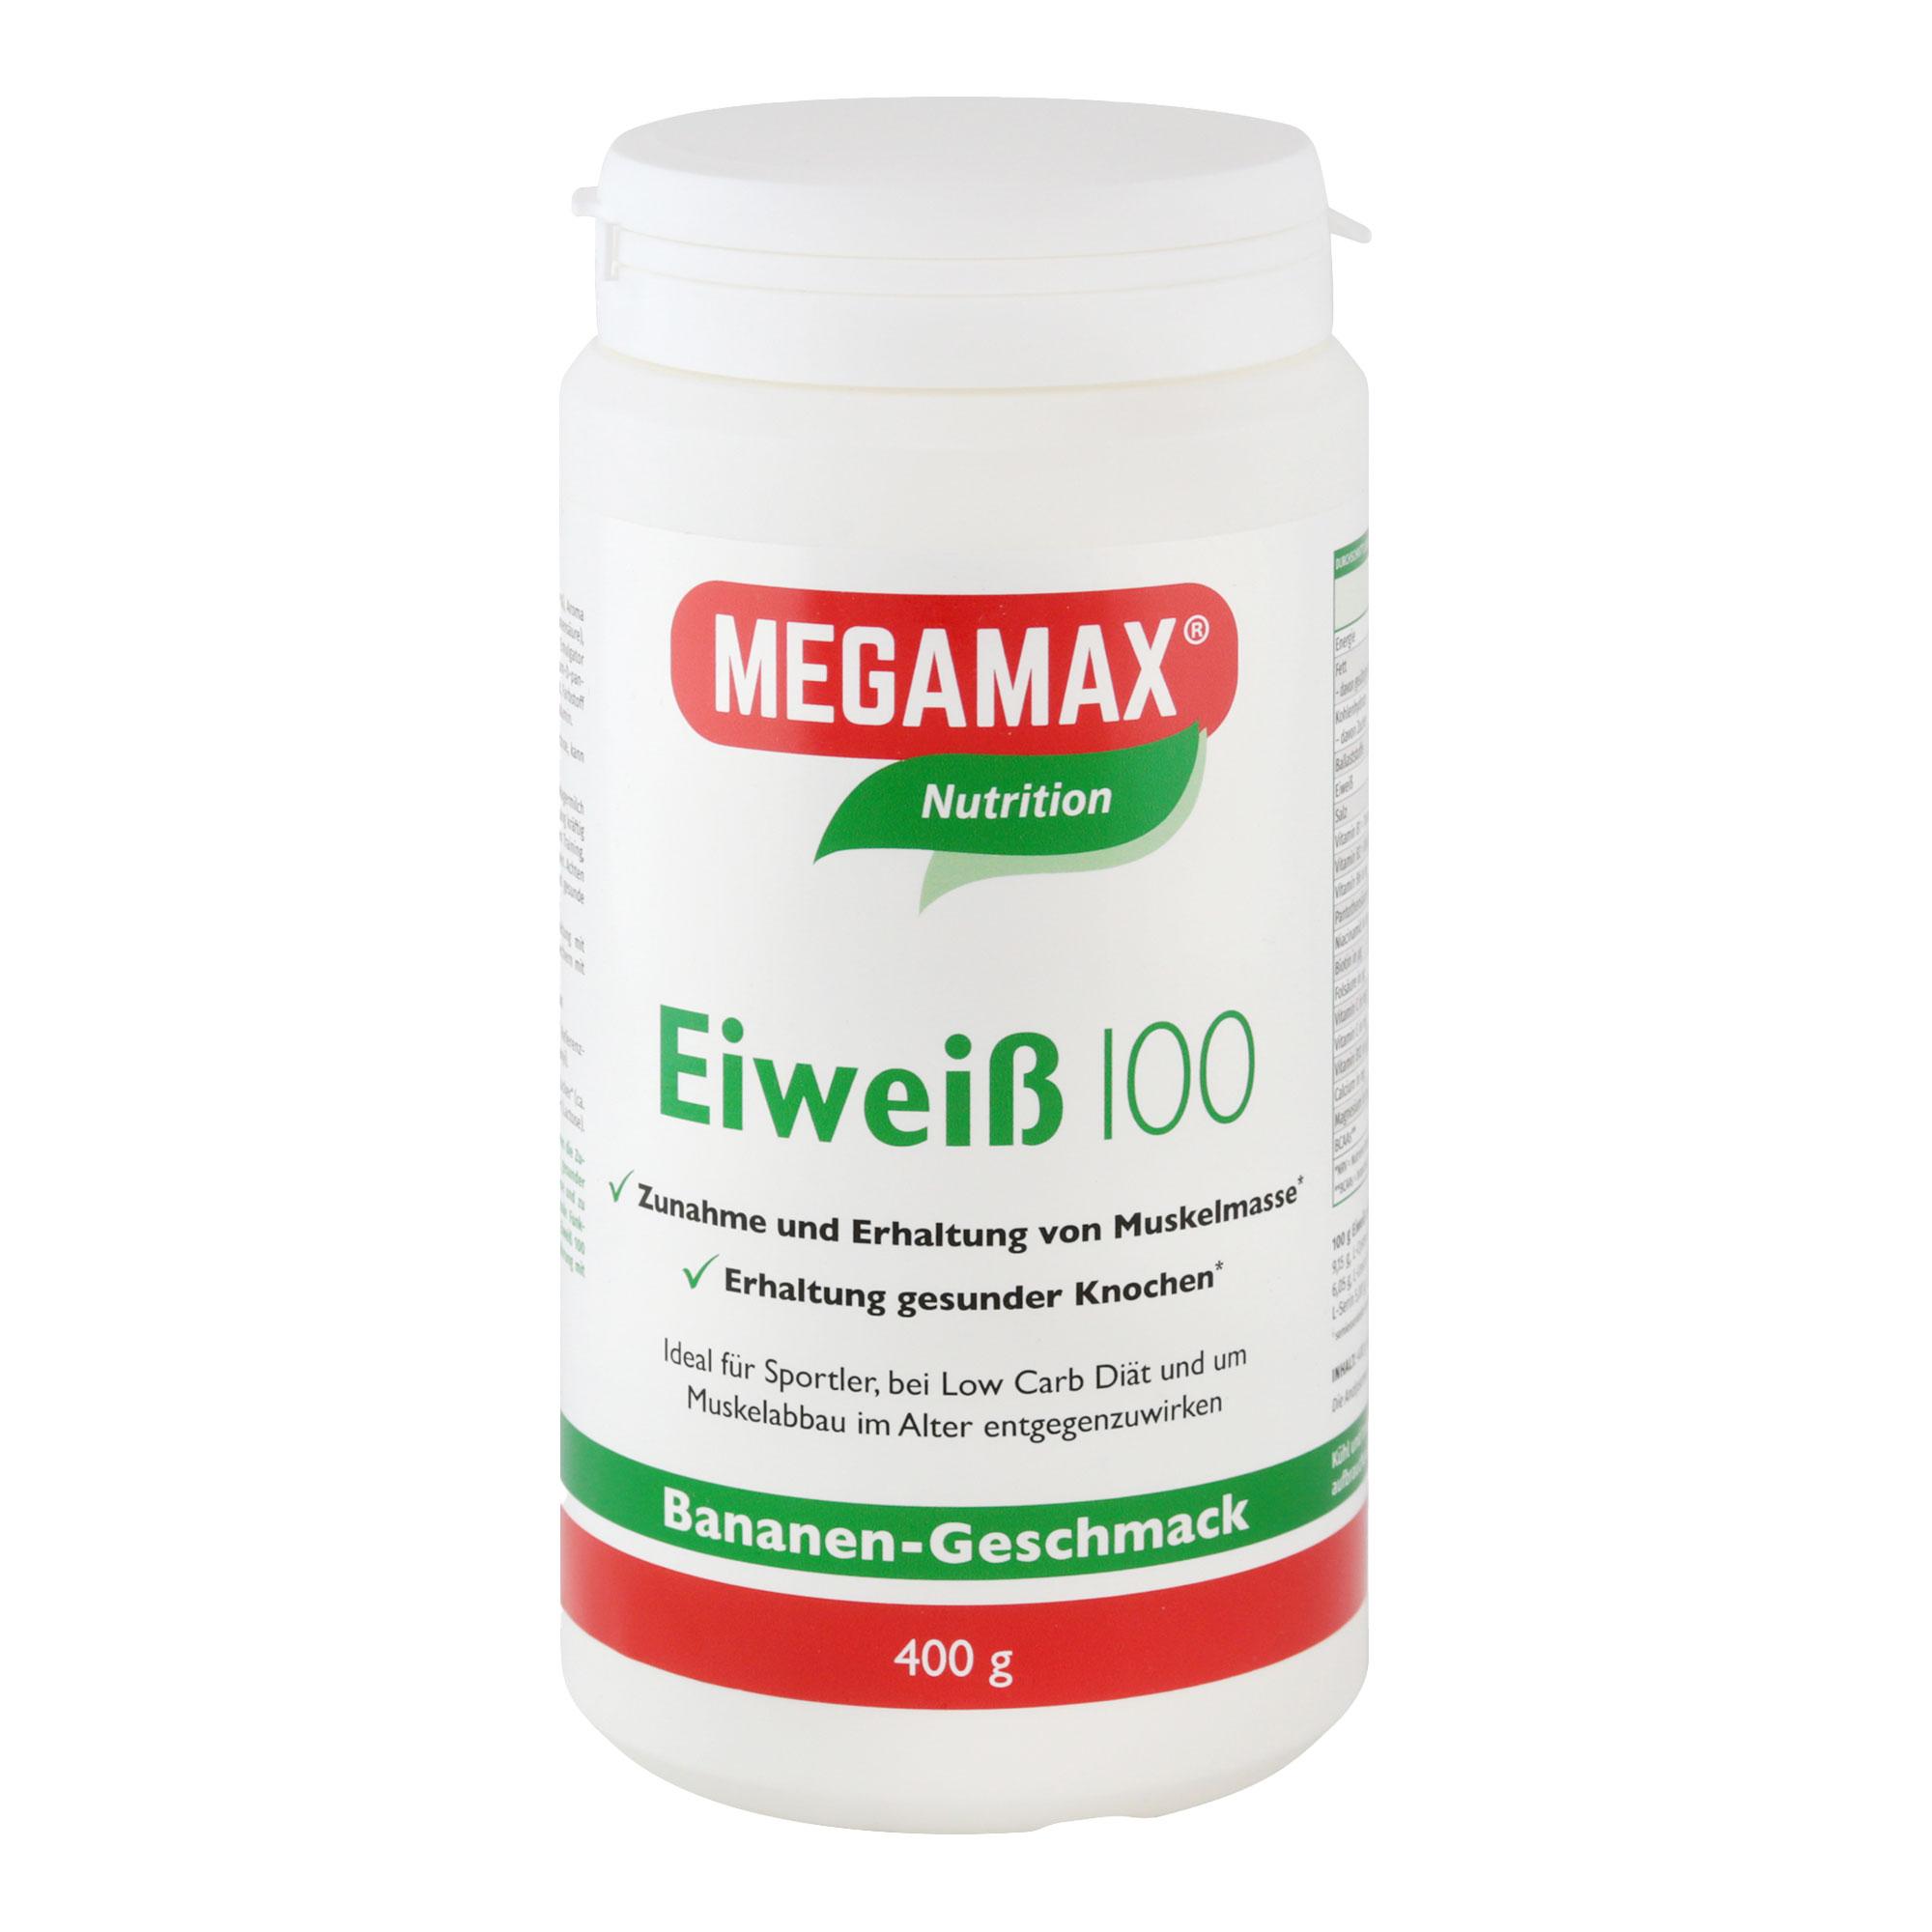 MegaMax Eiweiß 100 Banane